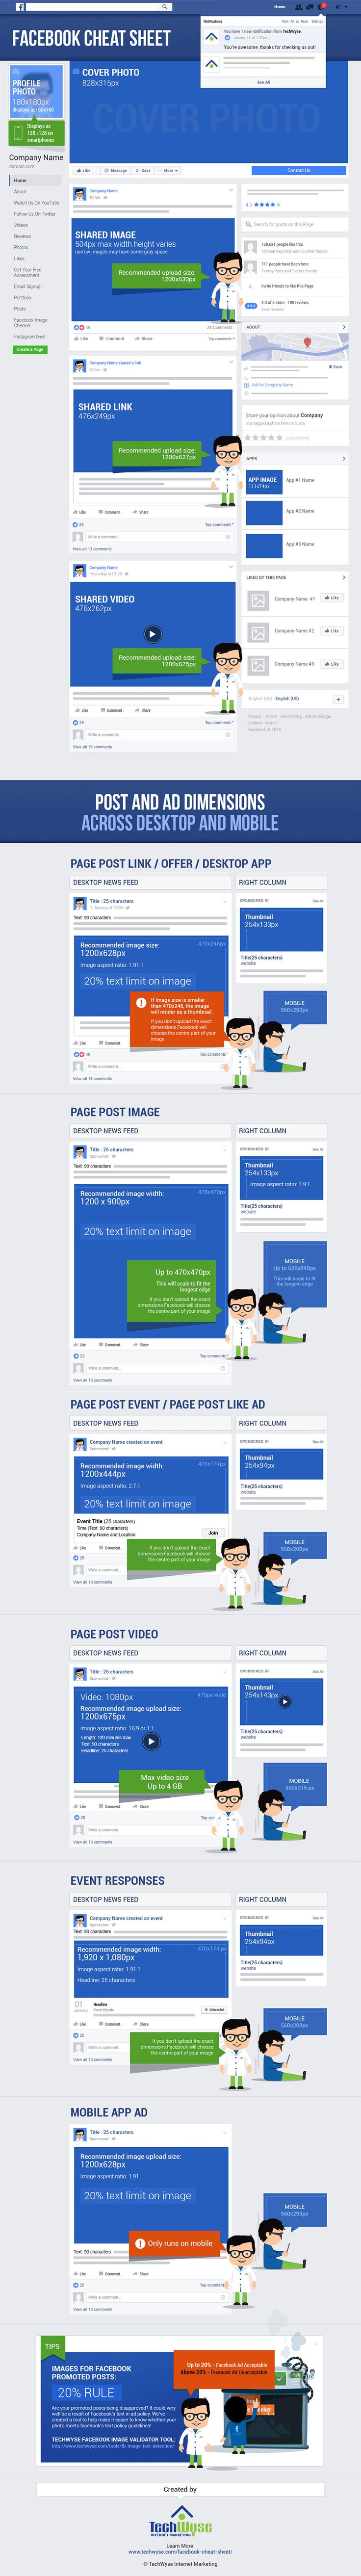 Facebook Cheatsheet Infographic